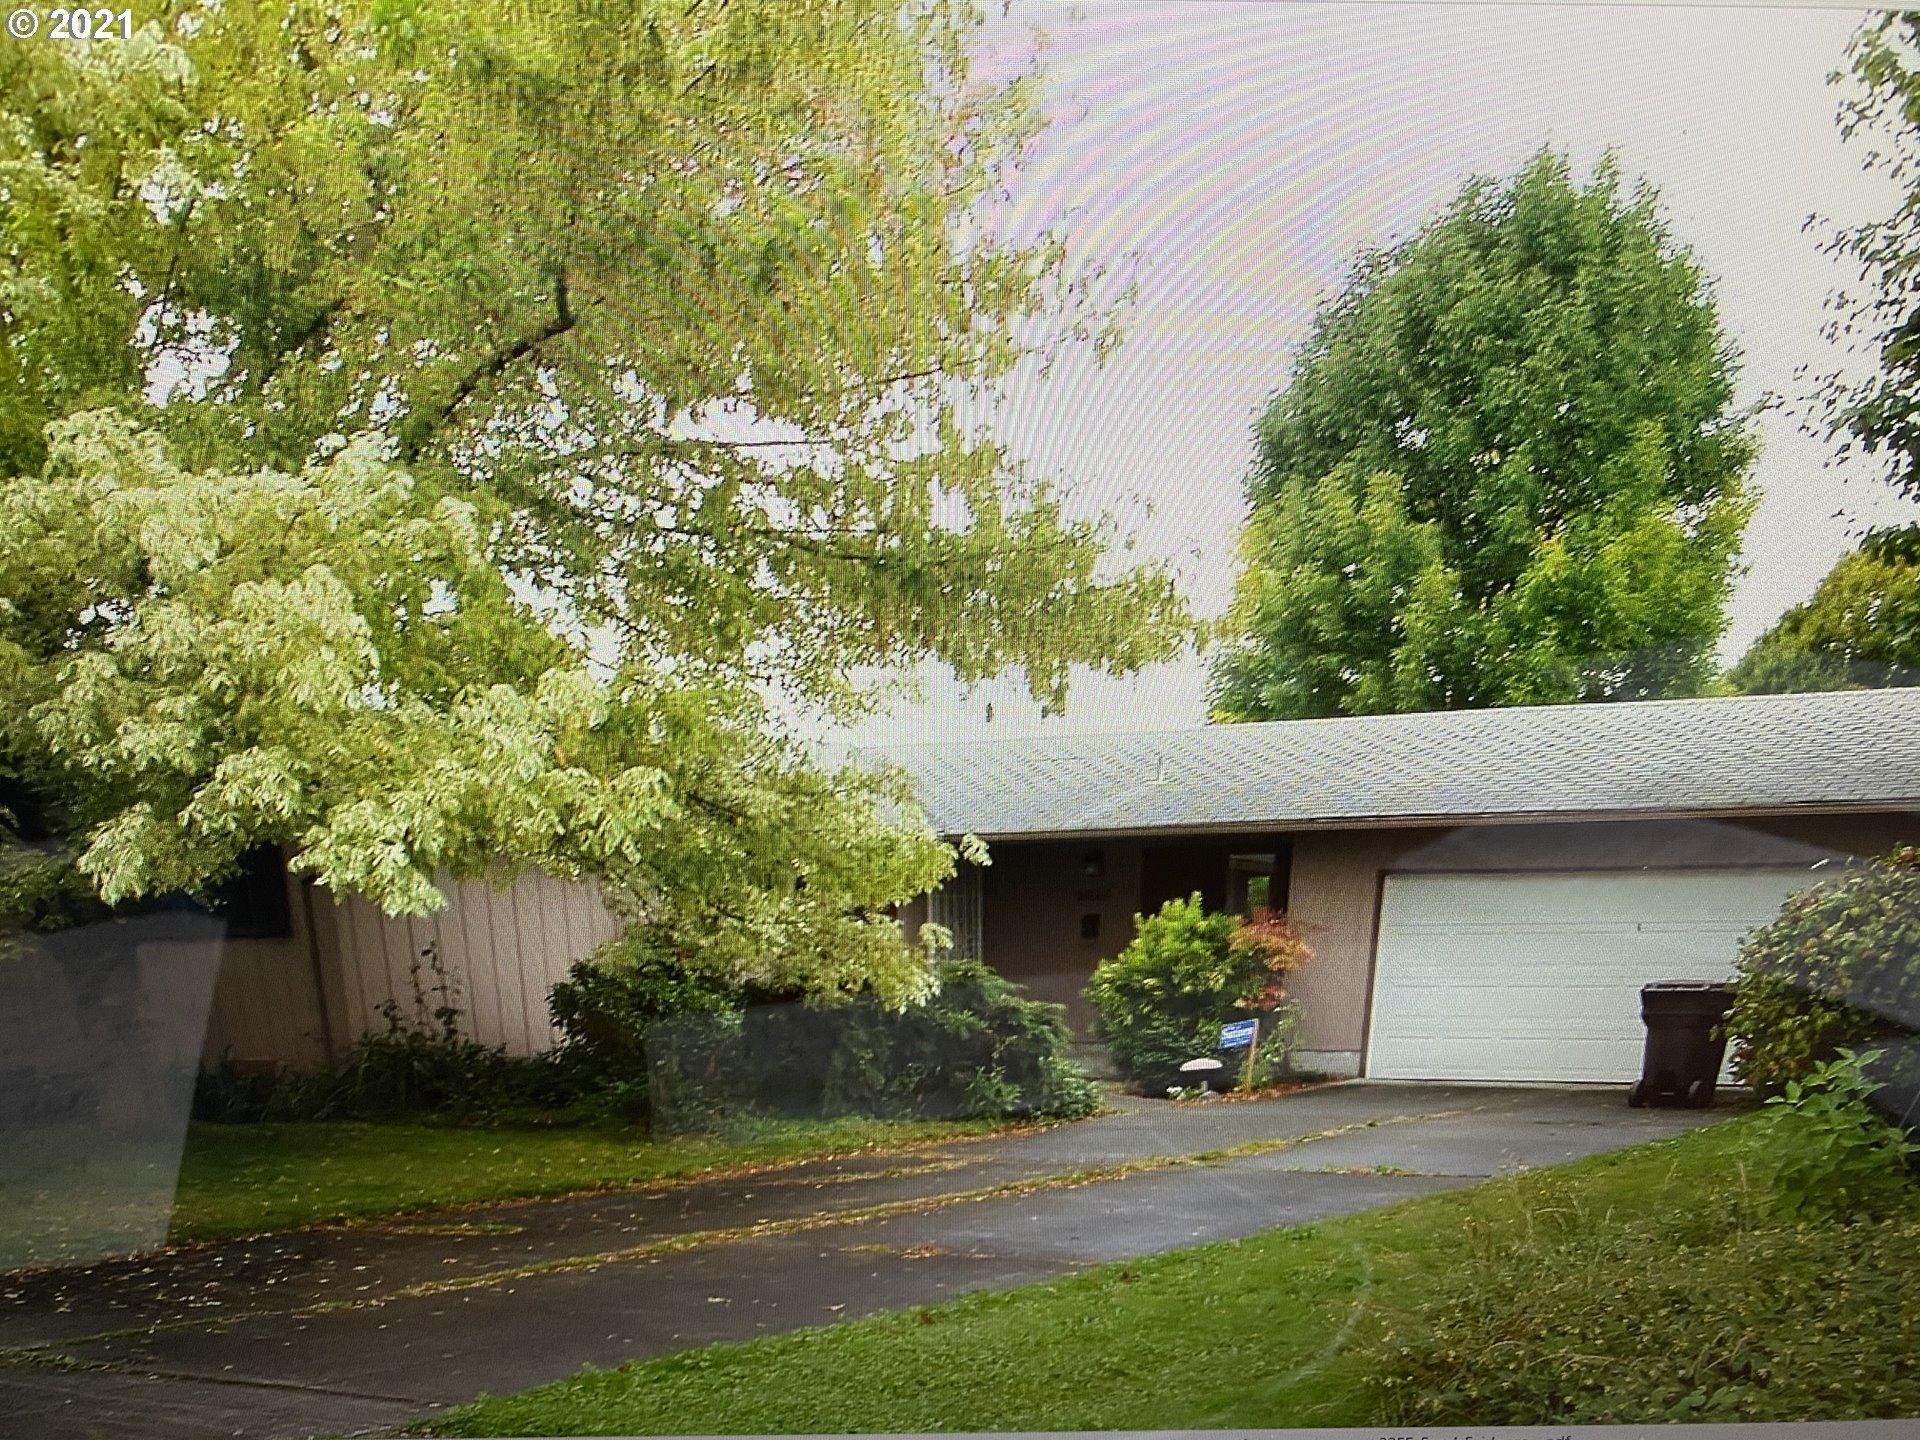 Photo for 1614 33RD AVE, Longview, WA 98632 (MLS # 21650203)